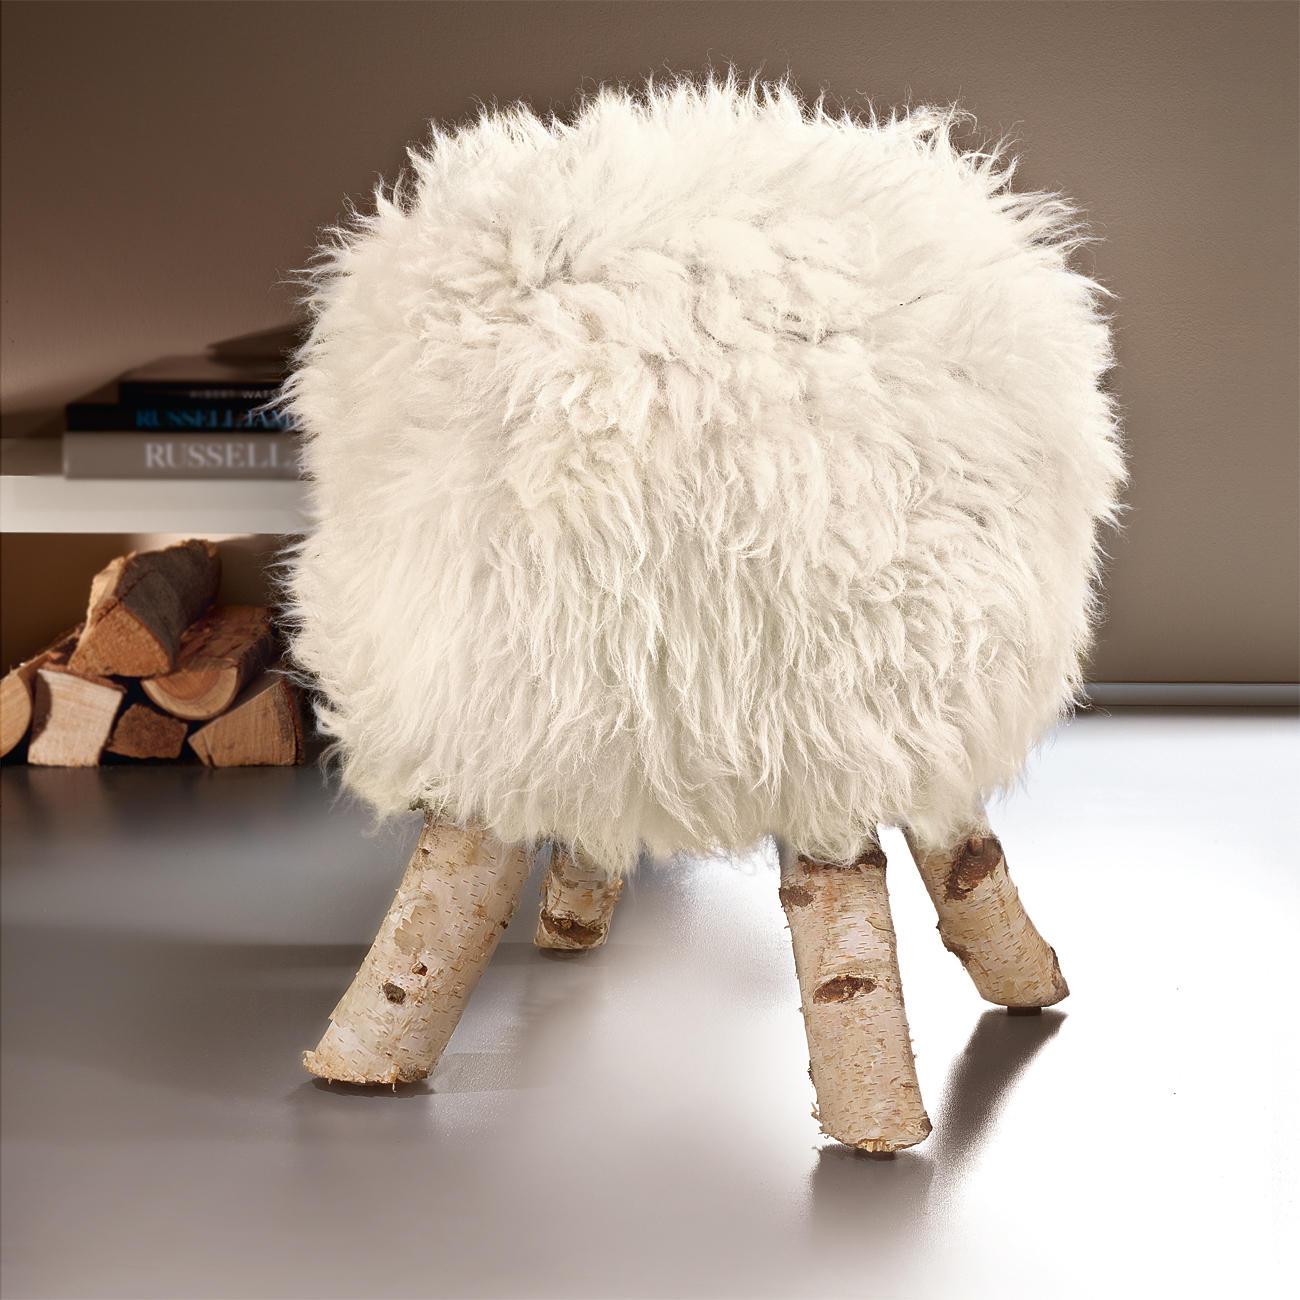 lammfell hocker 3 jahre garantie pro idee. Black Bedroom Furniture Sets. Home Design Ideas